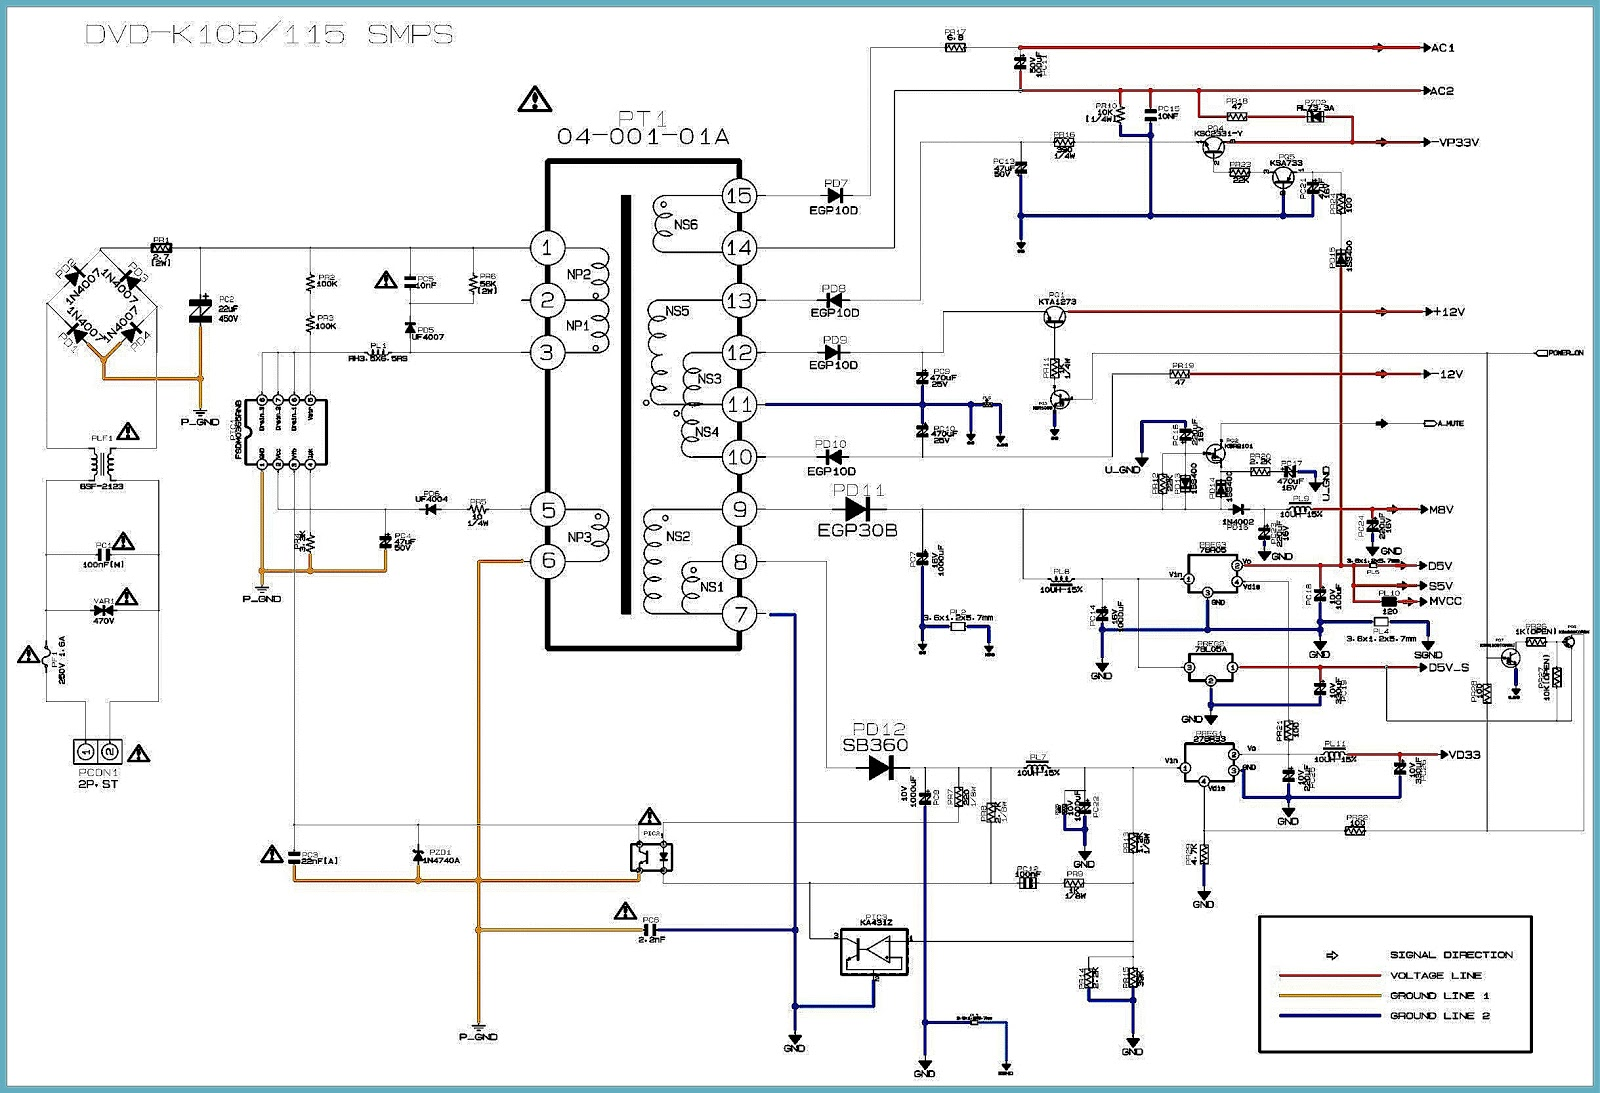 atx 450w smps circuit diagram chinese atv wiring 250cc  readingrat